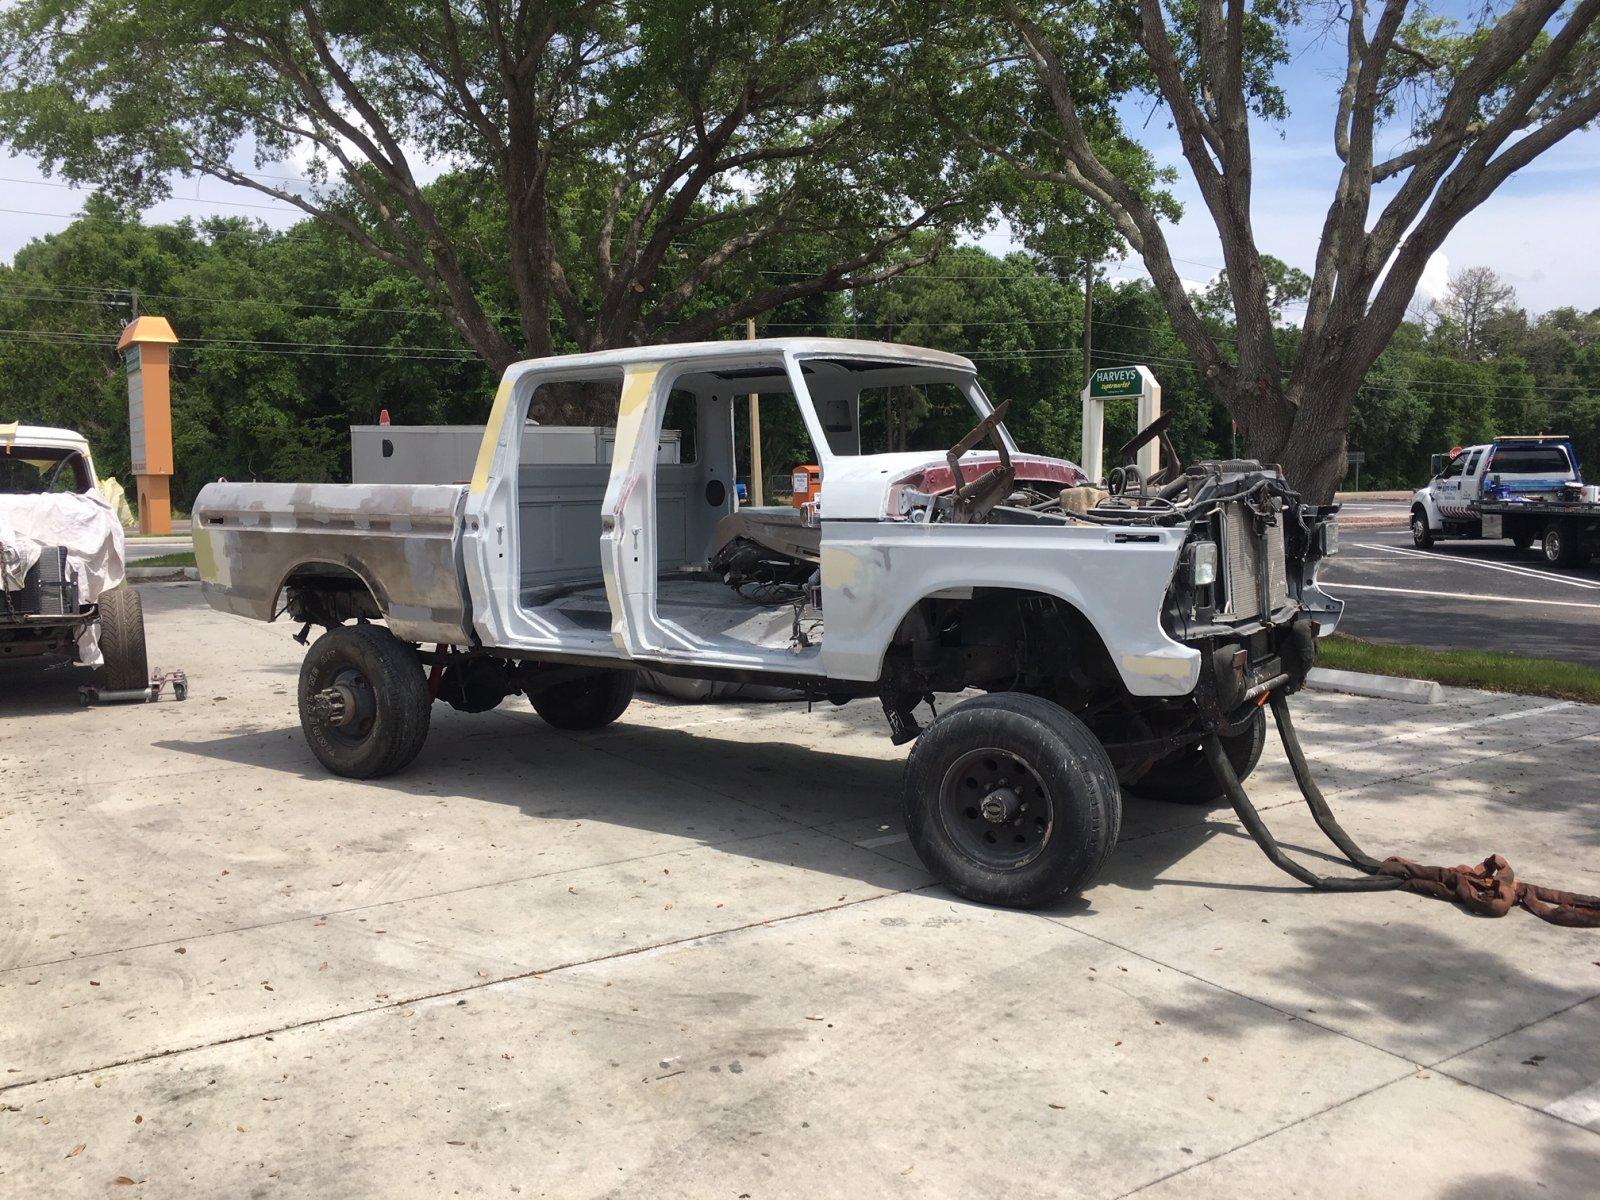 17 Year Old Built His Dream Truck F250 Crew Cab 7.3L Diesel 4.jpeg